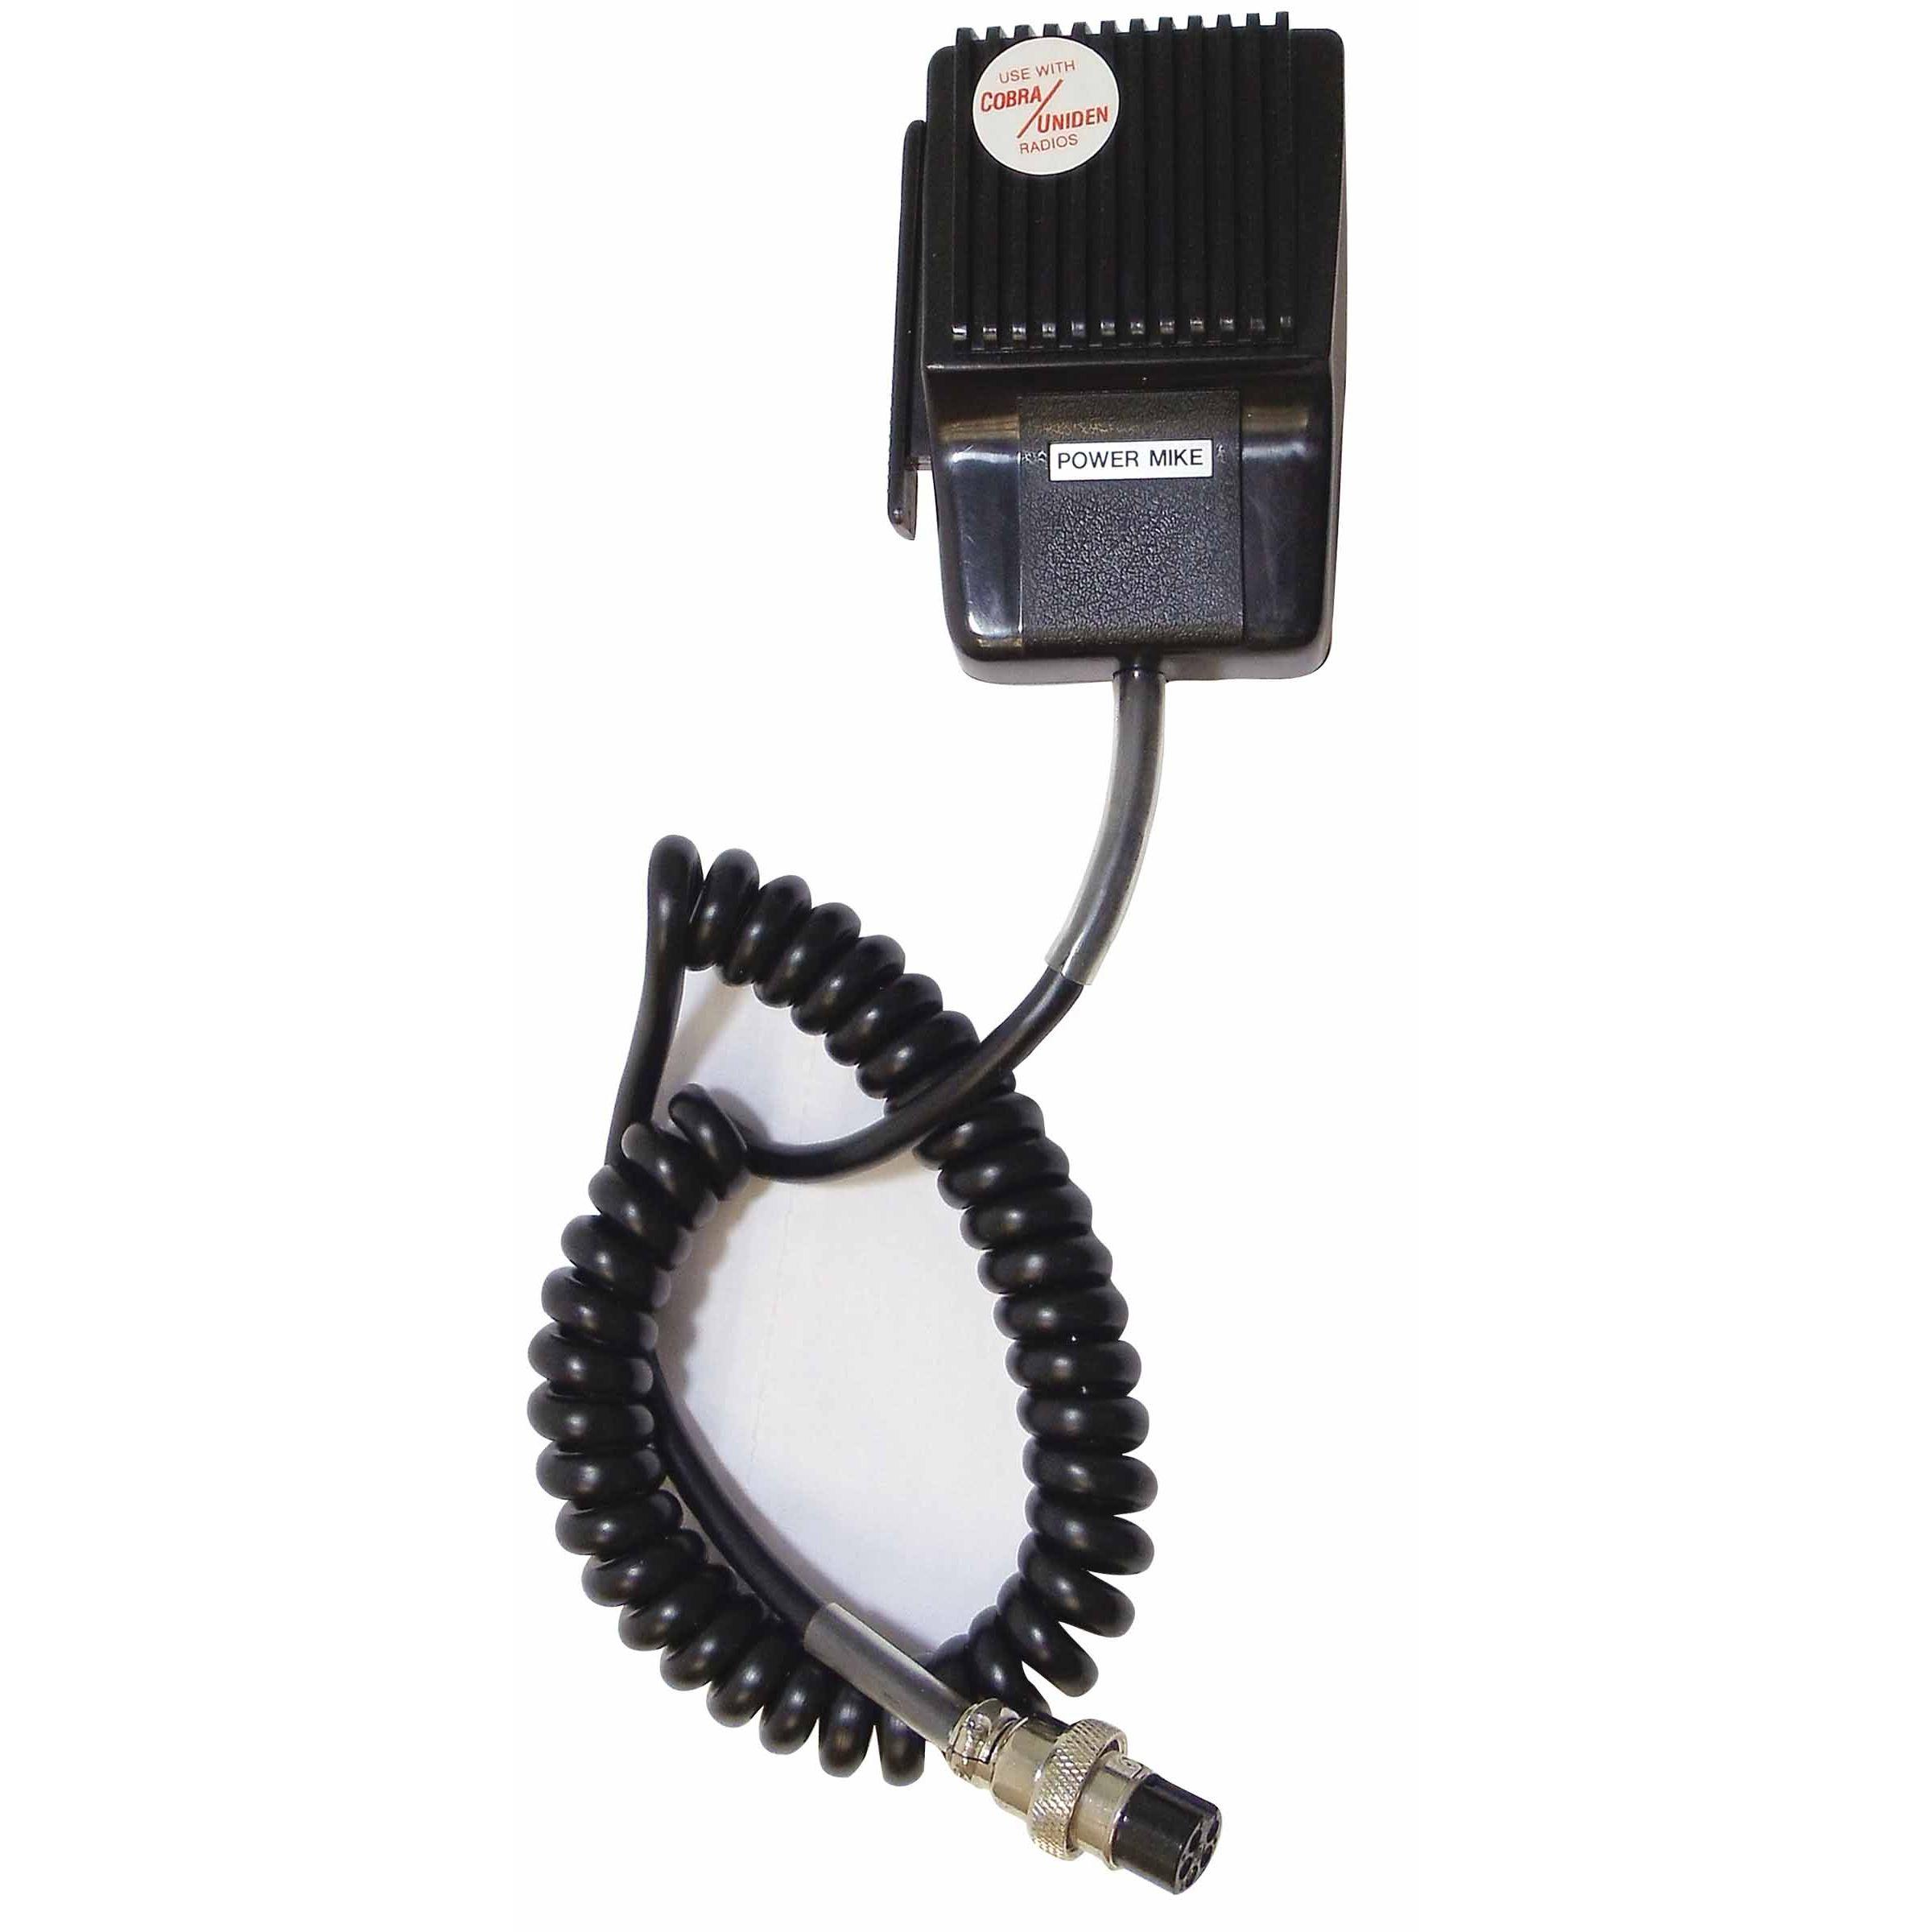 CBM35SB - Marmat 5 Pin Side Band Power Microphone